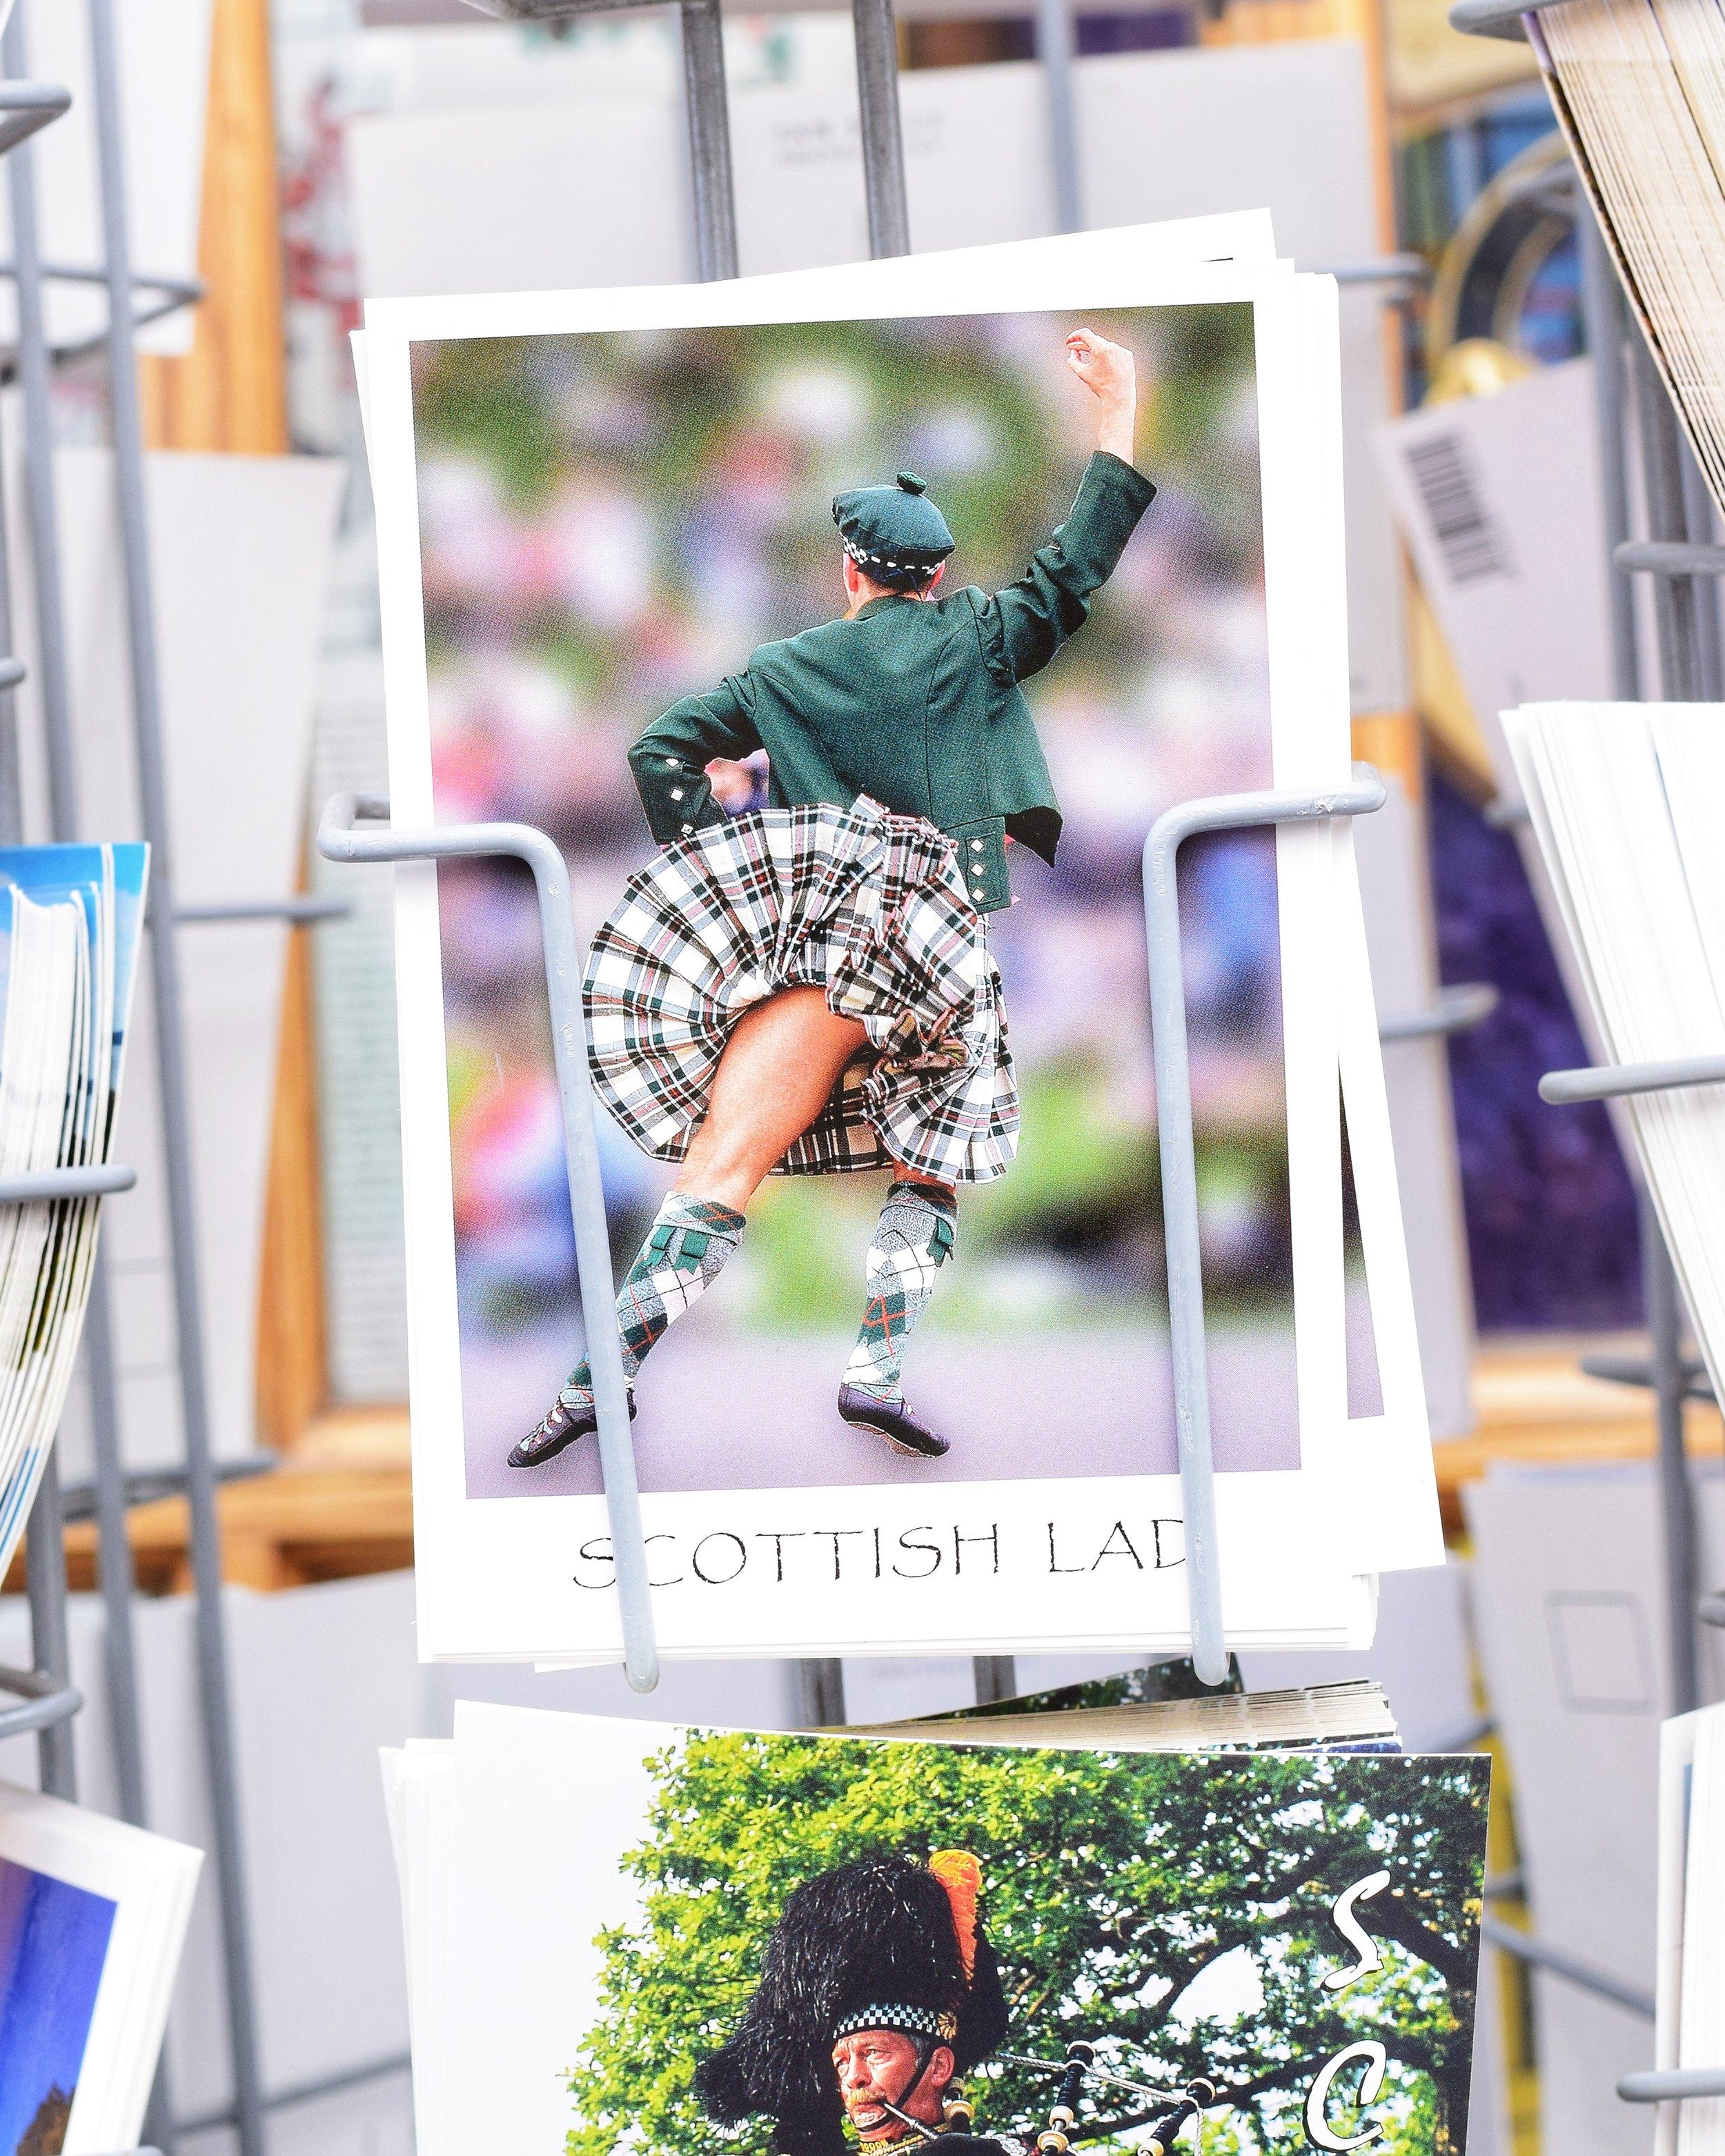 The Titled Kilt, Inverness, Scotland